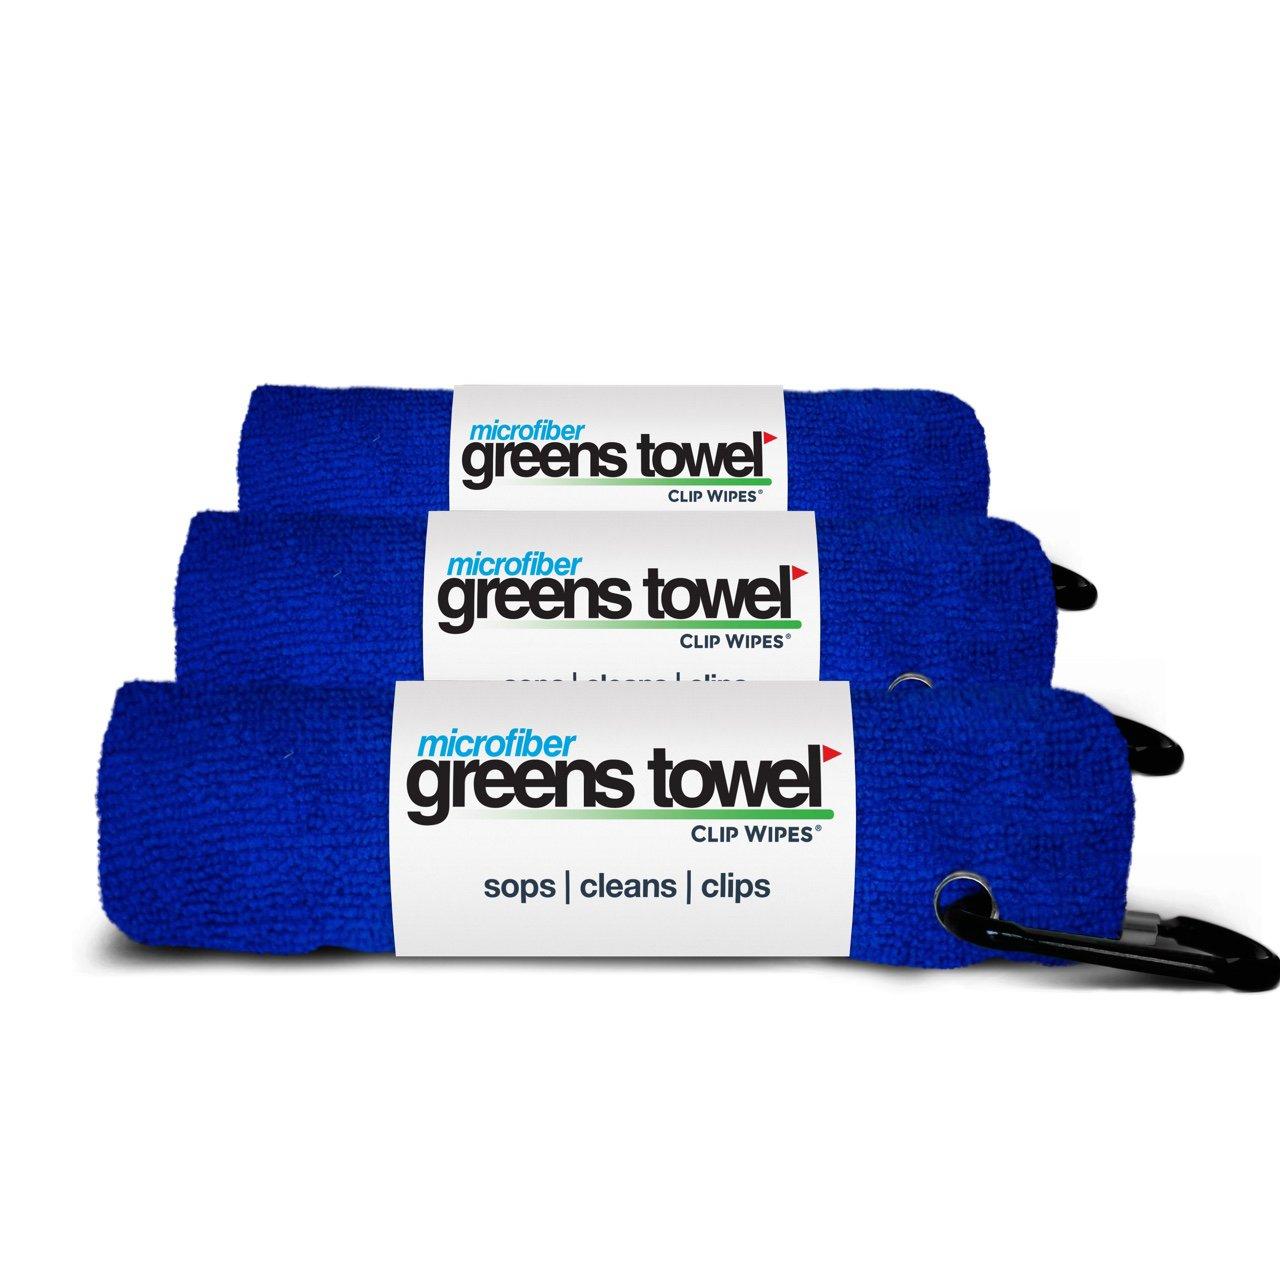 3 Pack of Royal Blue Microfiber Golf Towels by Greens Towel